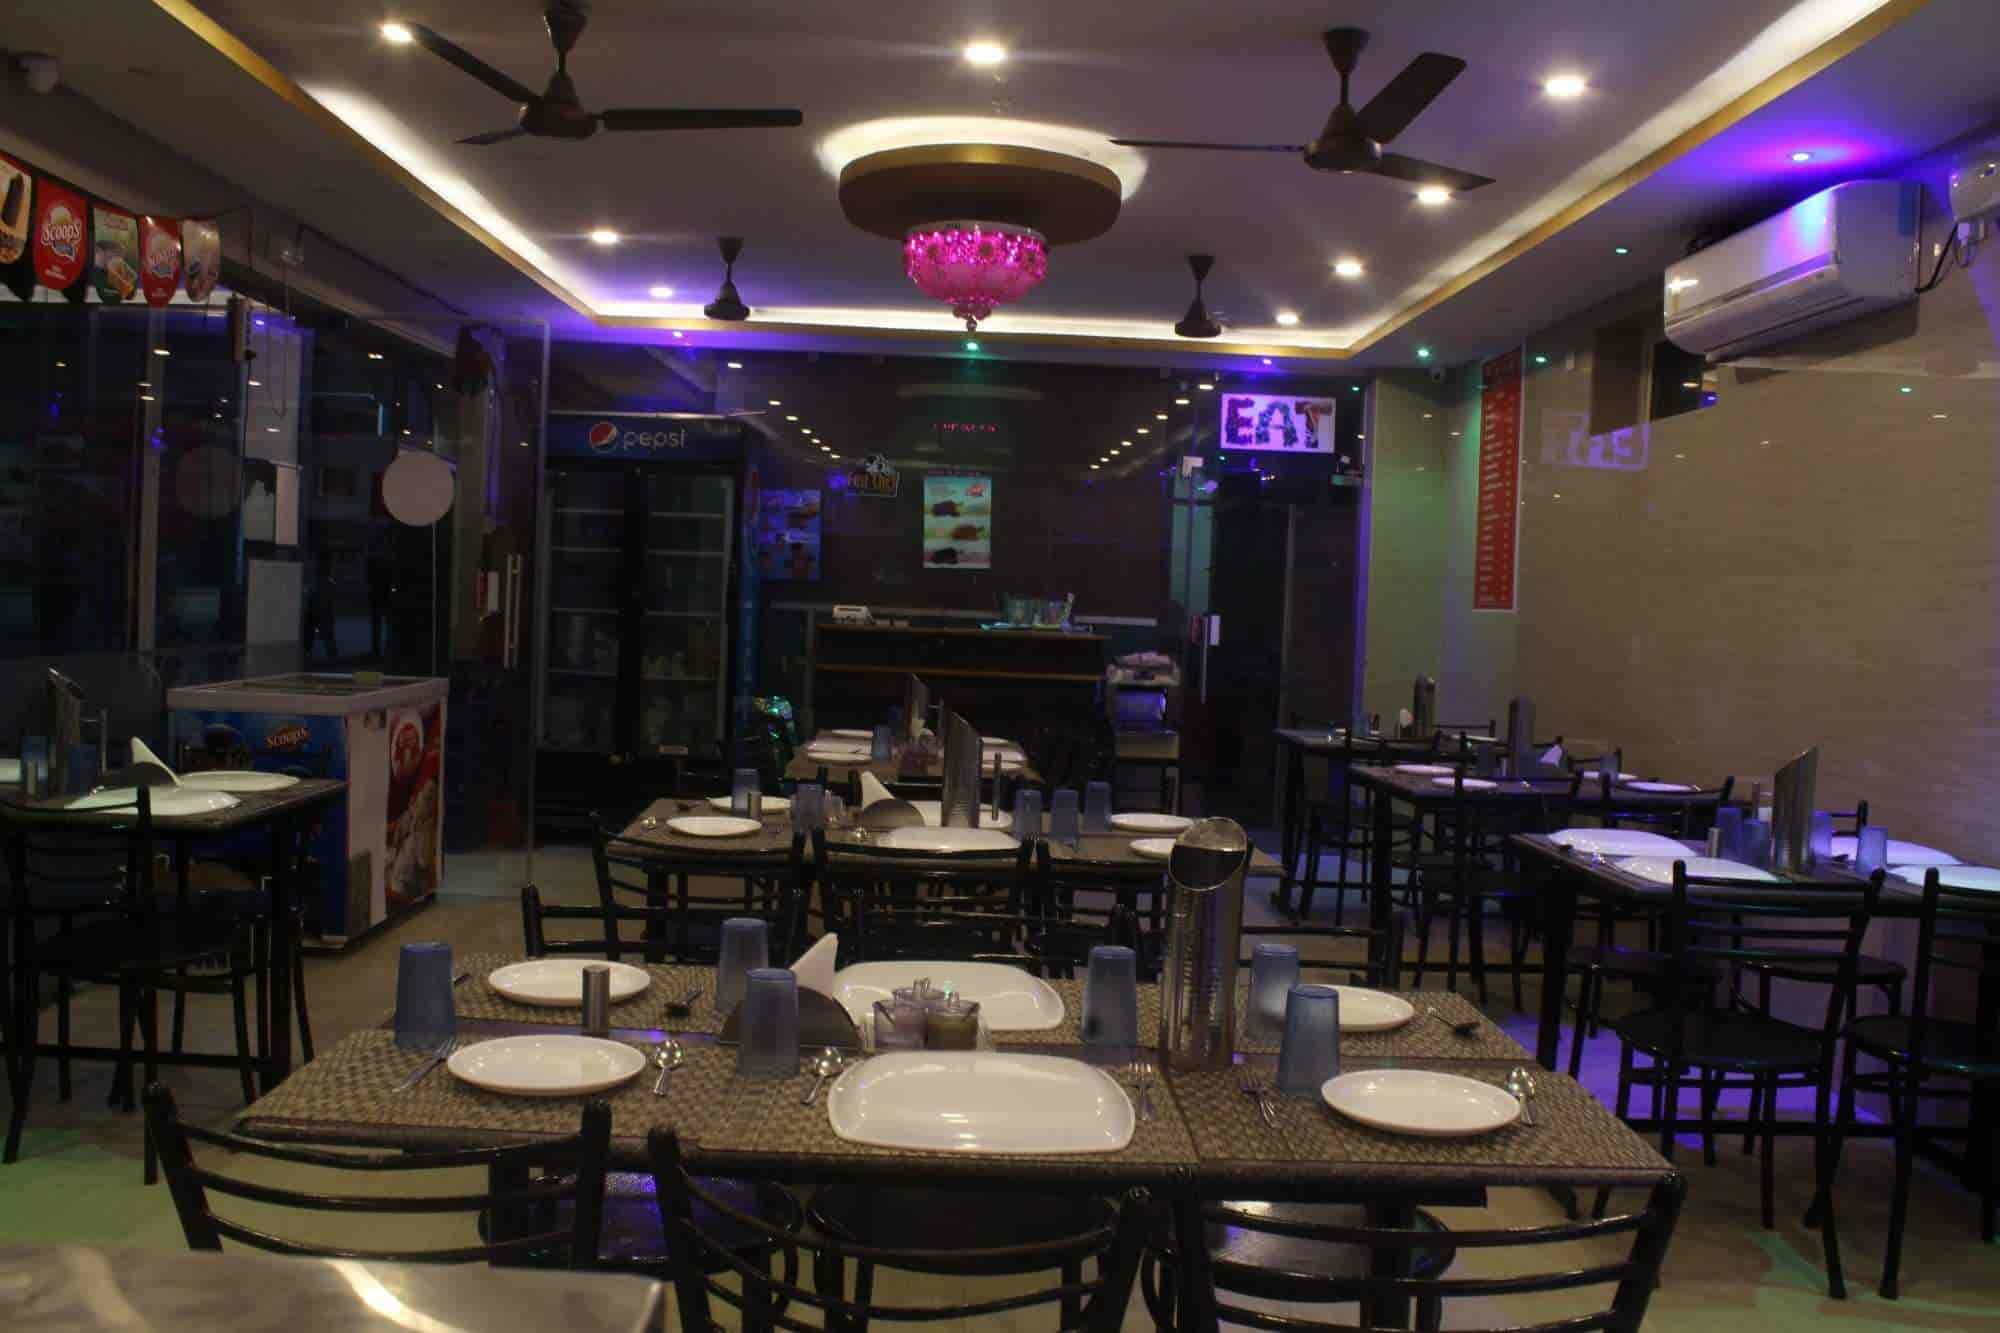 Sruthis Dine In Restaurant And Bakery Mini Banquet Hall Photos Rajvihar Kurnool Restaurants